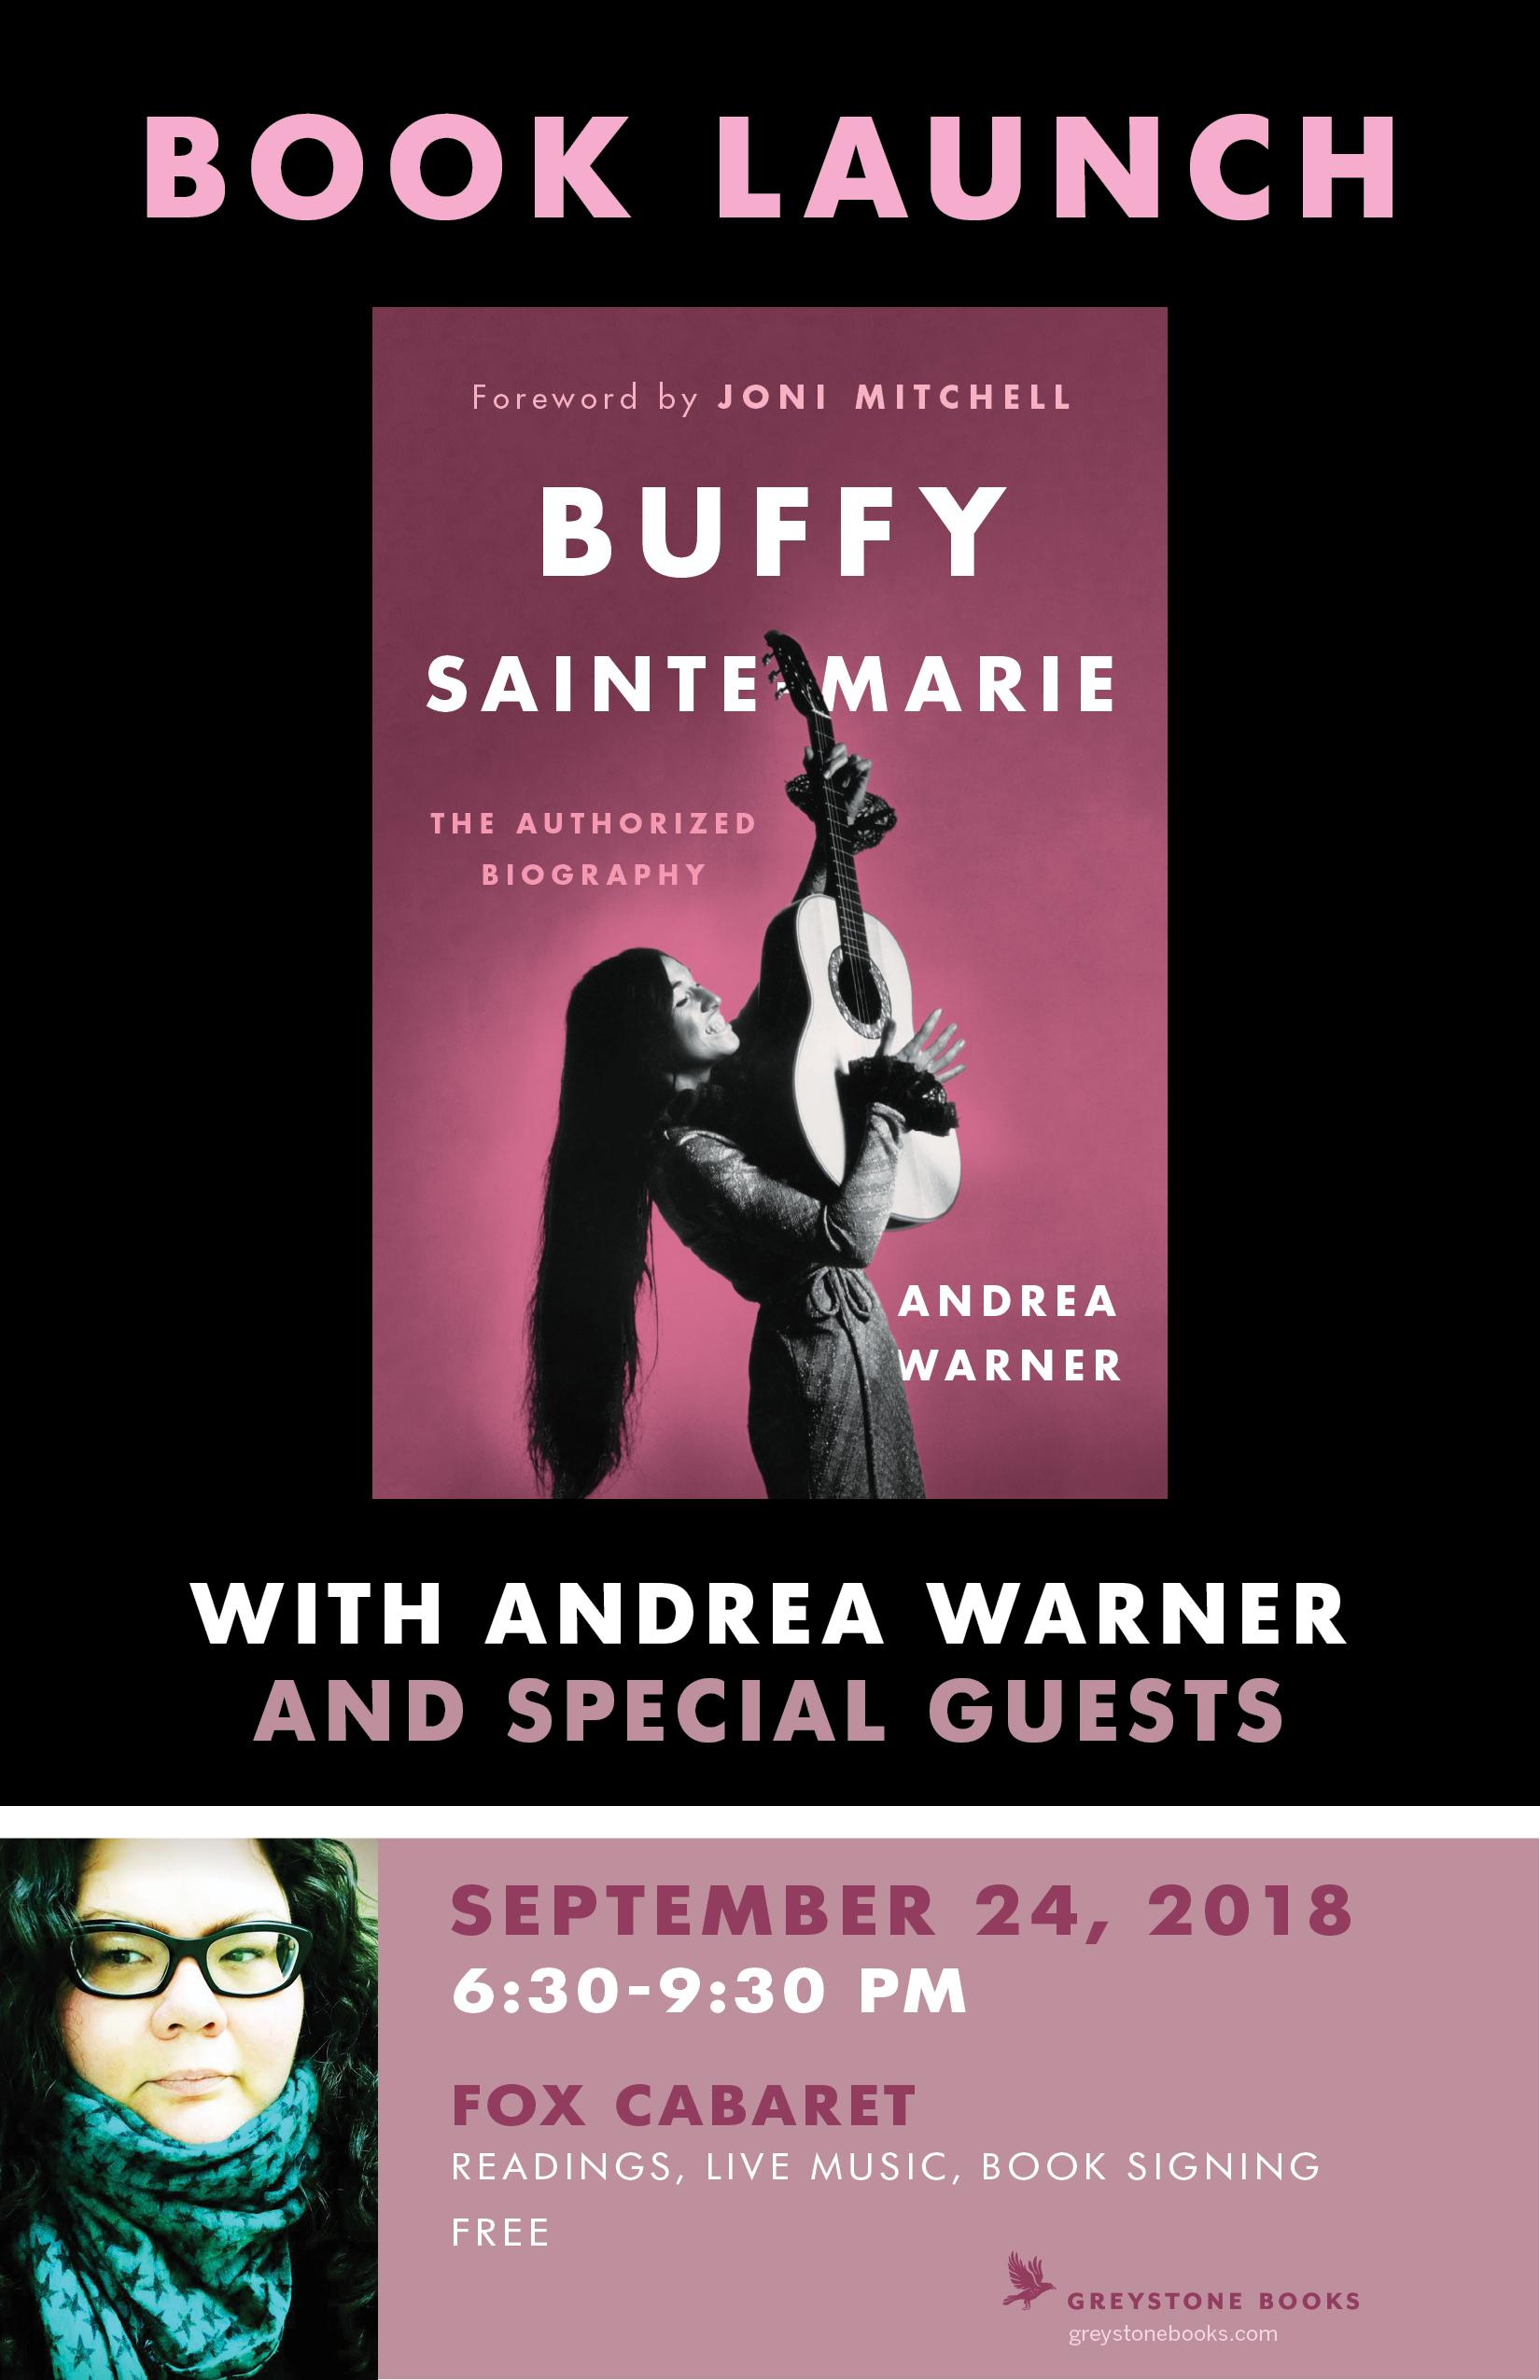 Buffy Poster-Andrea Warner event.jpg